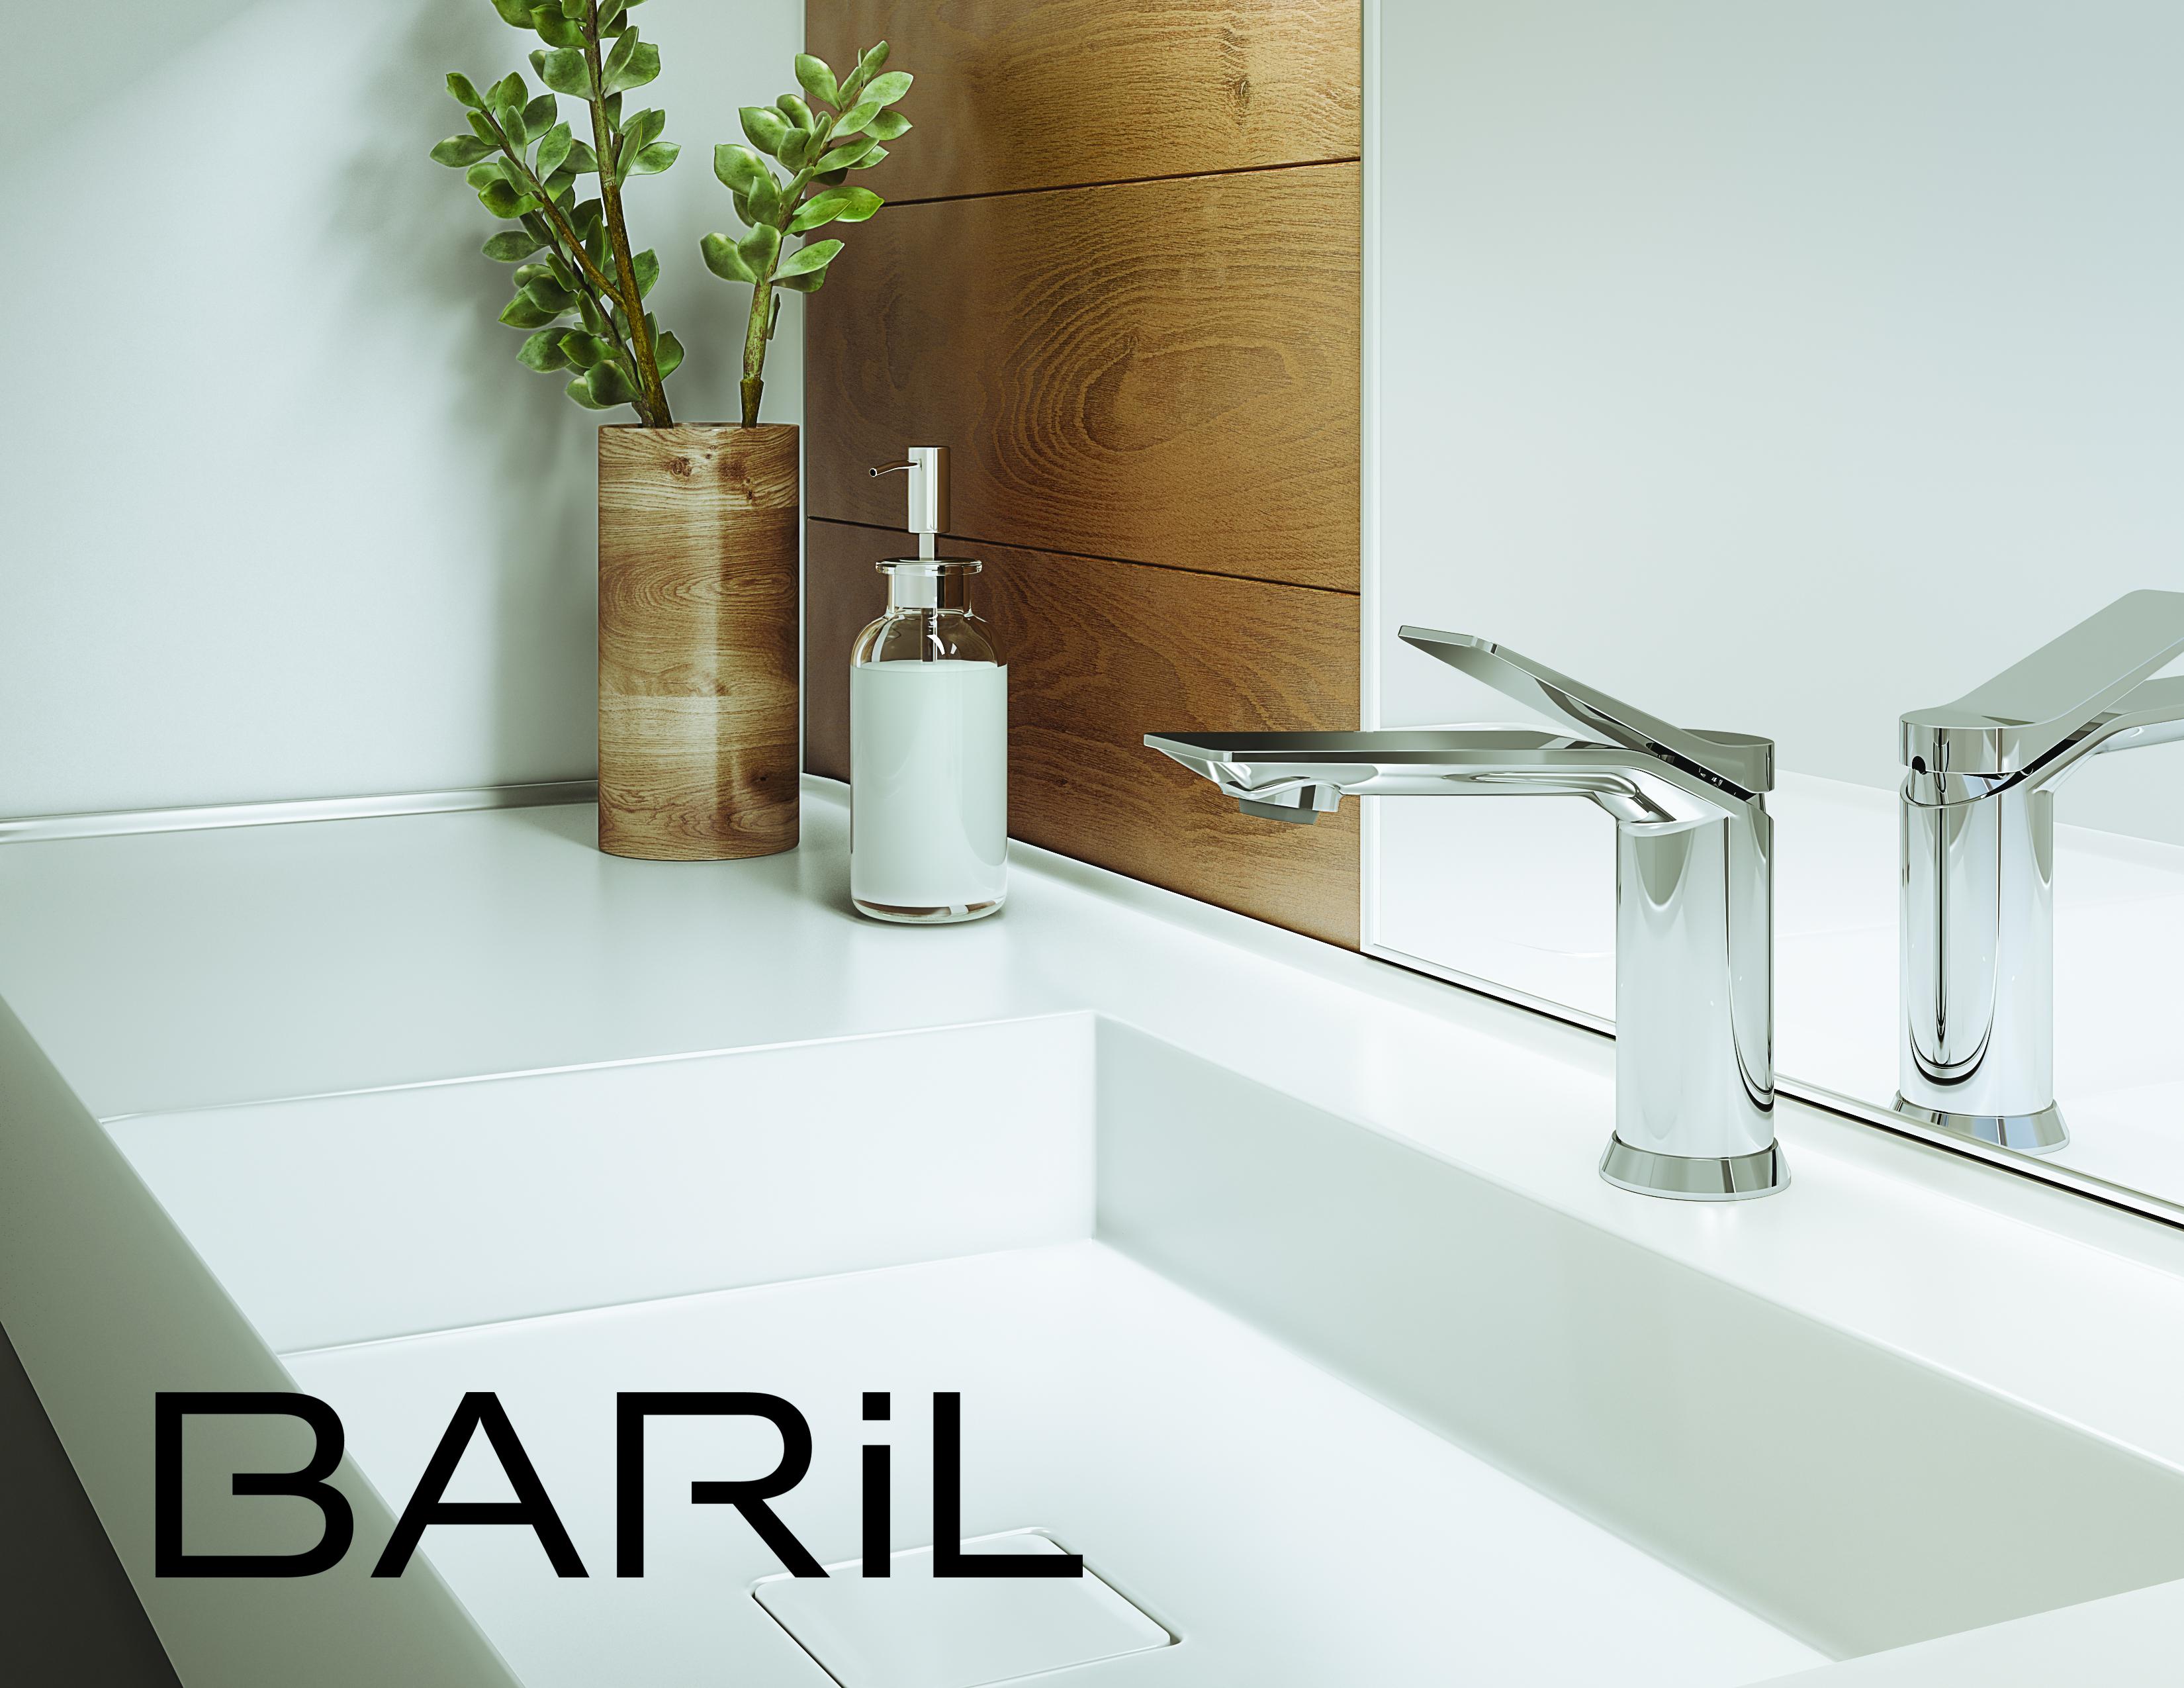 BARiLe Profile Single Lever Faucet